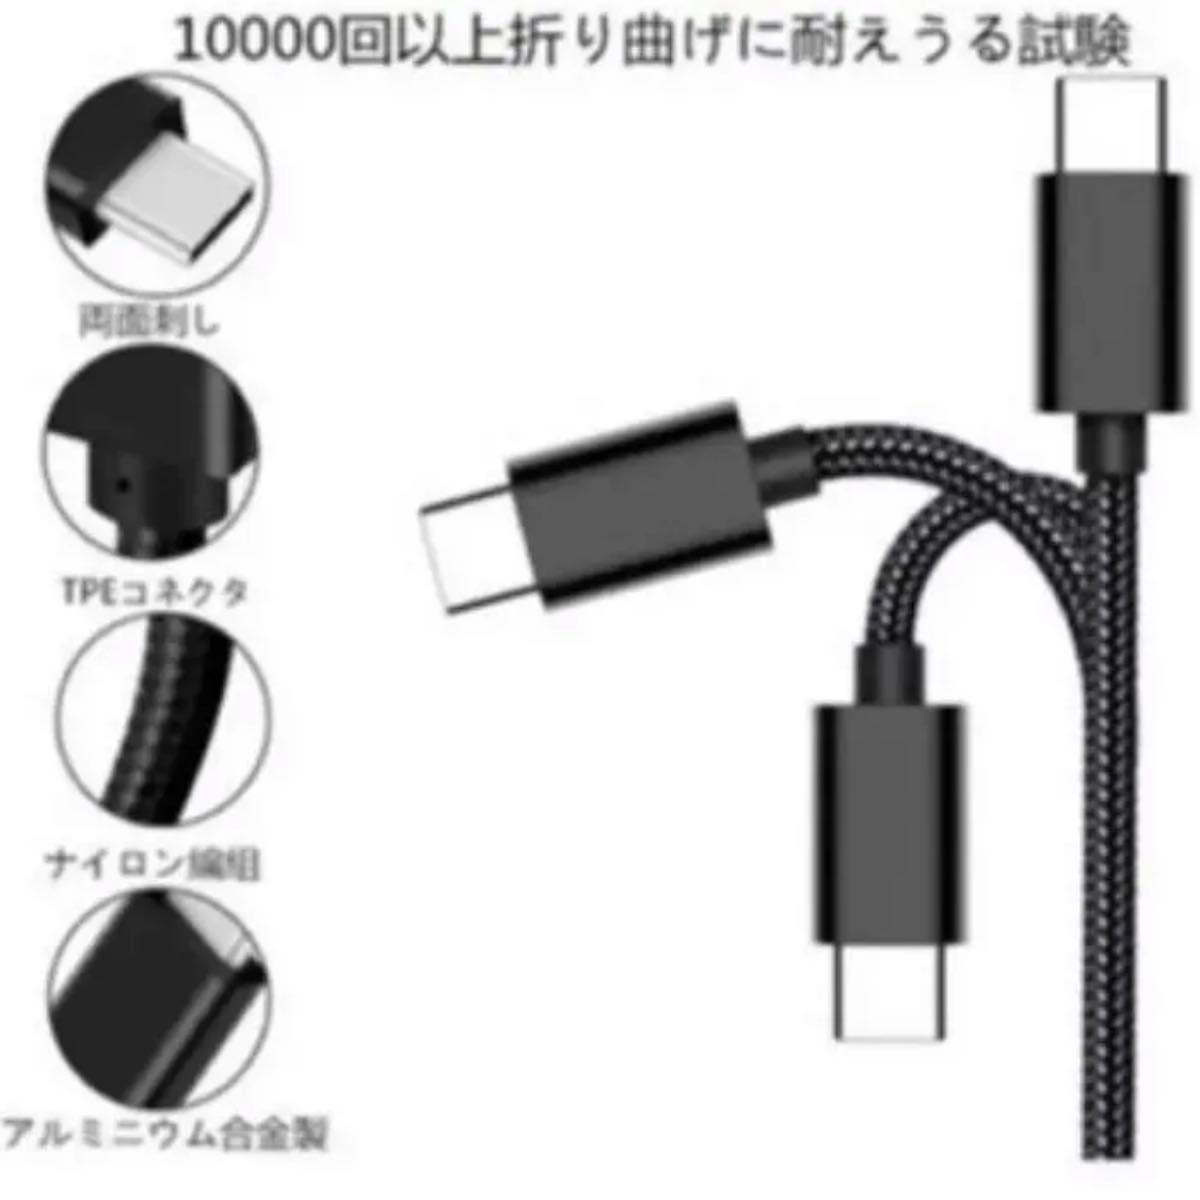 USB C/Type c to Type c ケーブル 1m USB-C ケーブル【USB3.1 ケーブル Gen2 PD対応